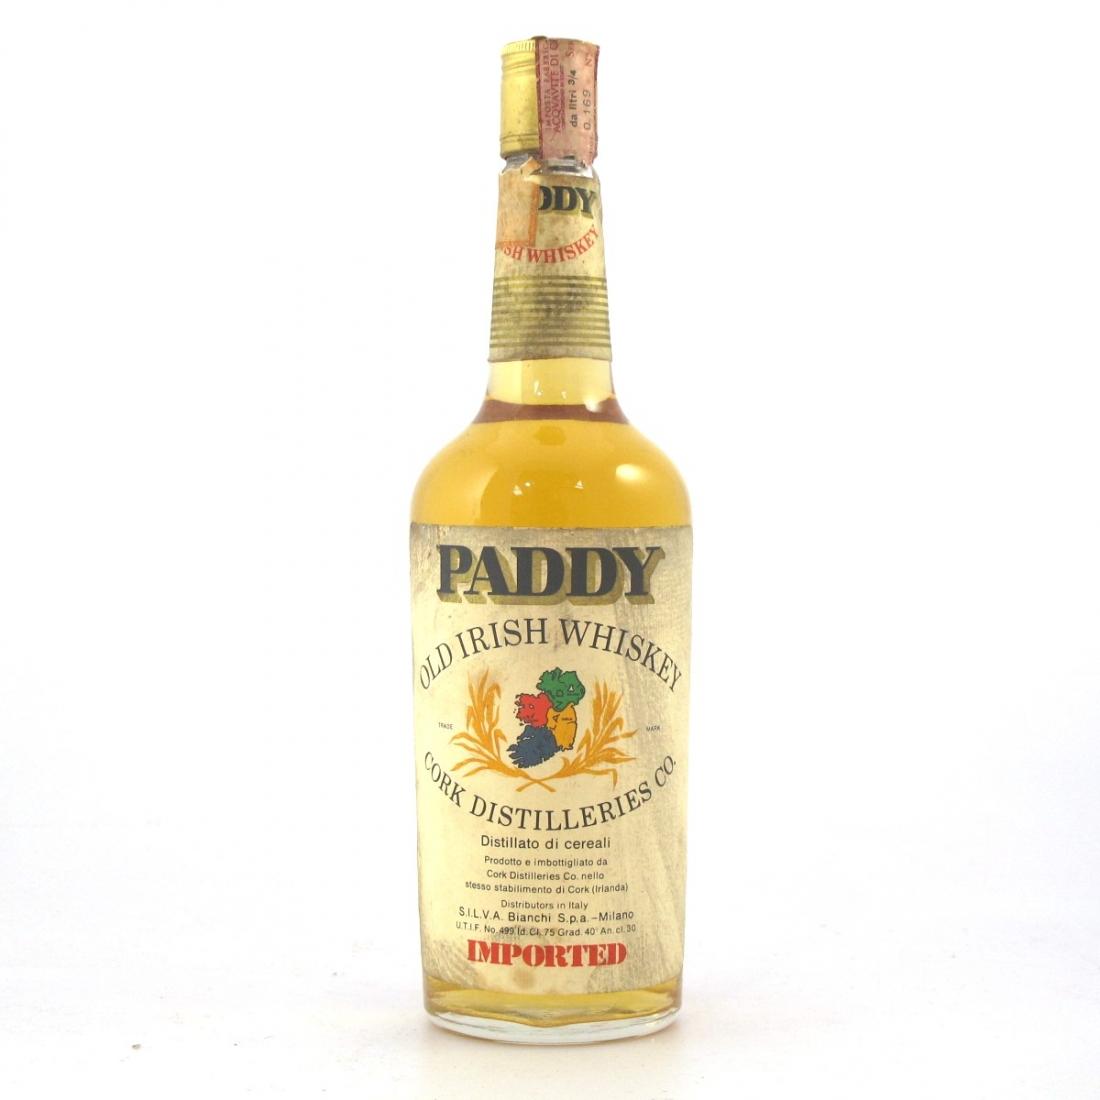 Paddy Old Irish Whiskey 1970s